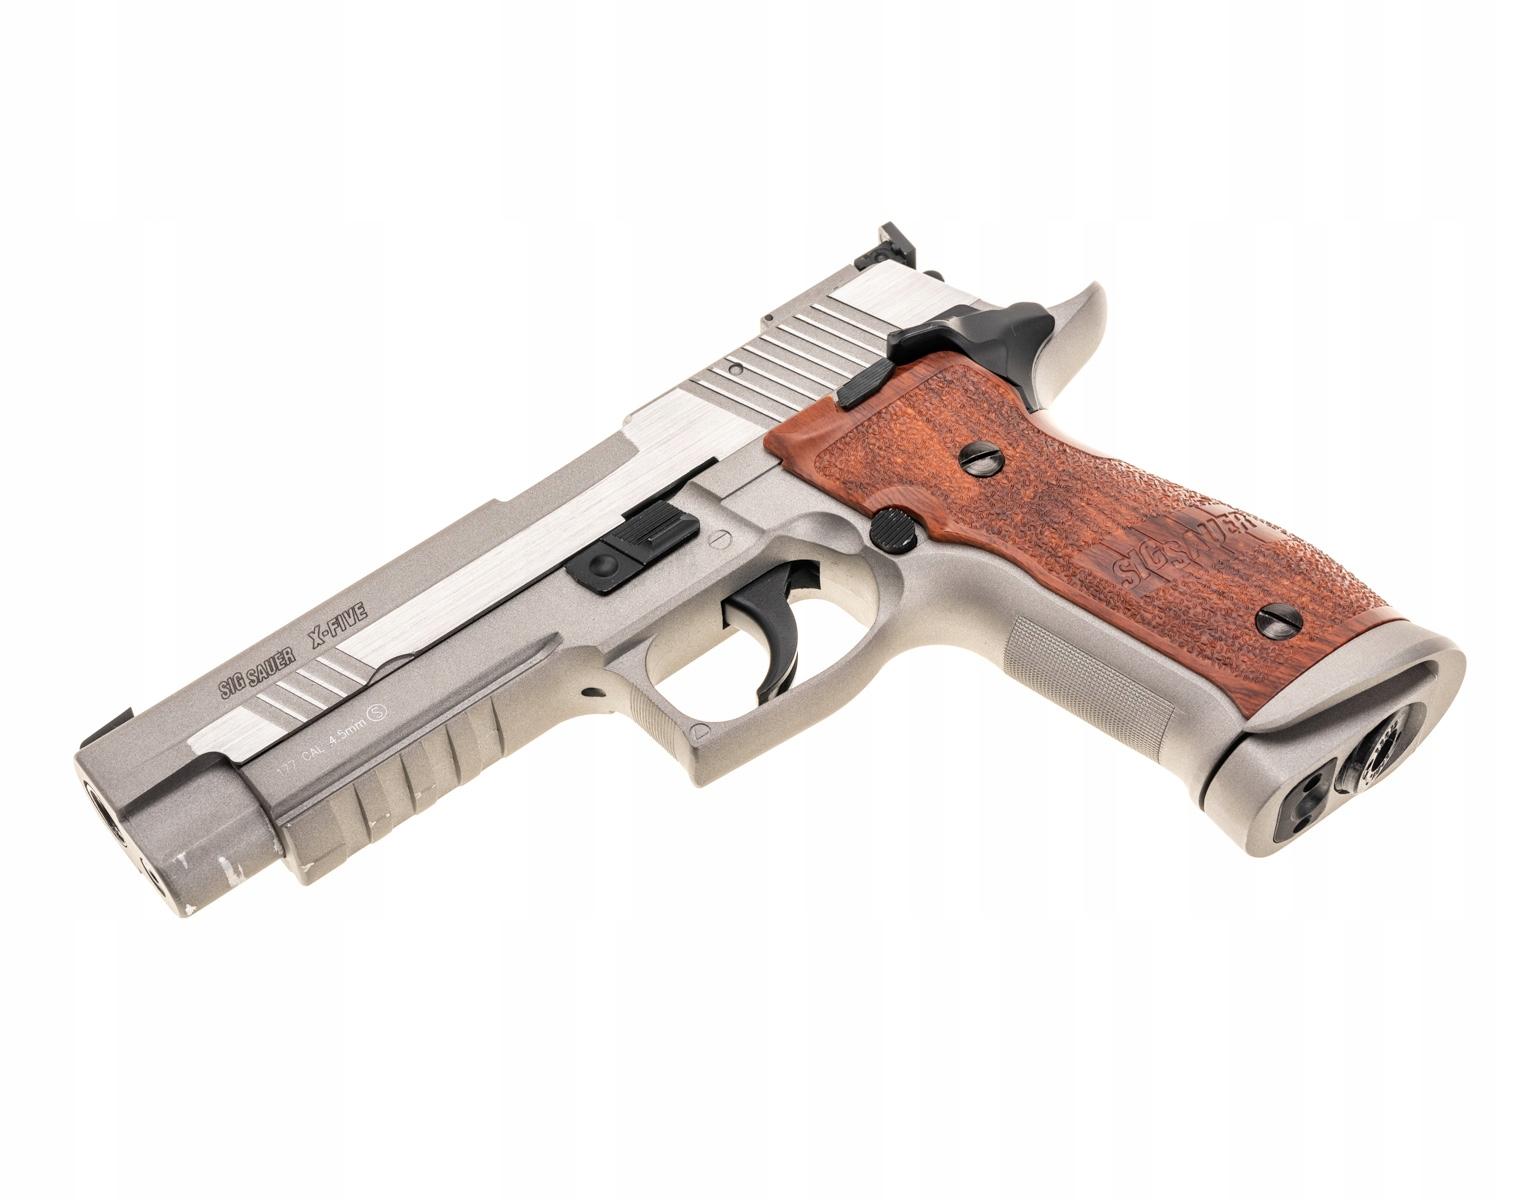 Wiatrówka Sig Sauer P226 X-Five 4,5 mm - silver